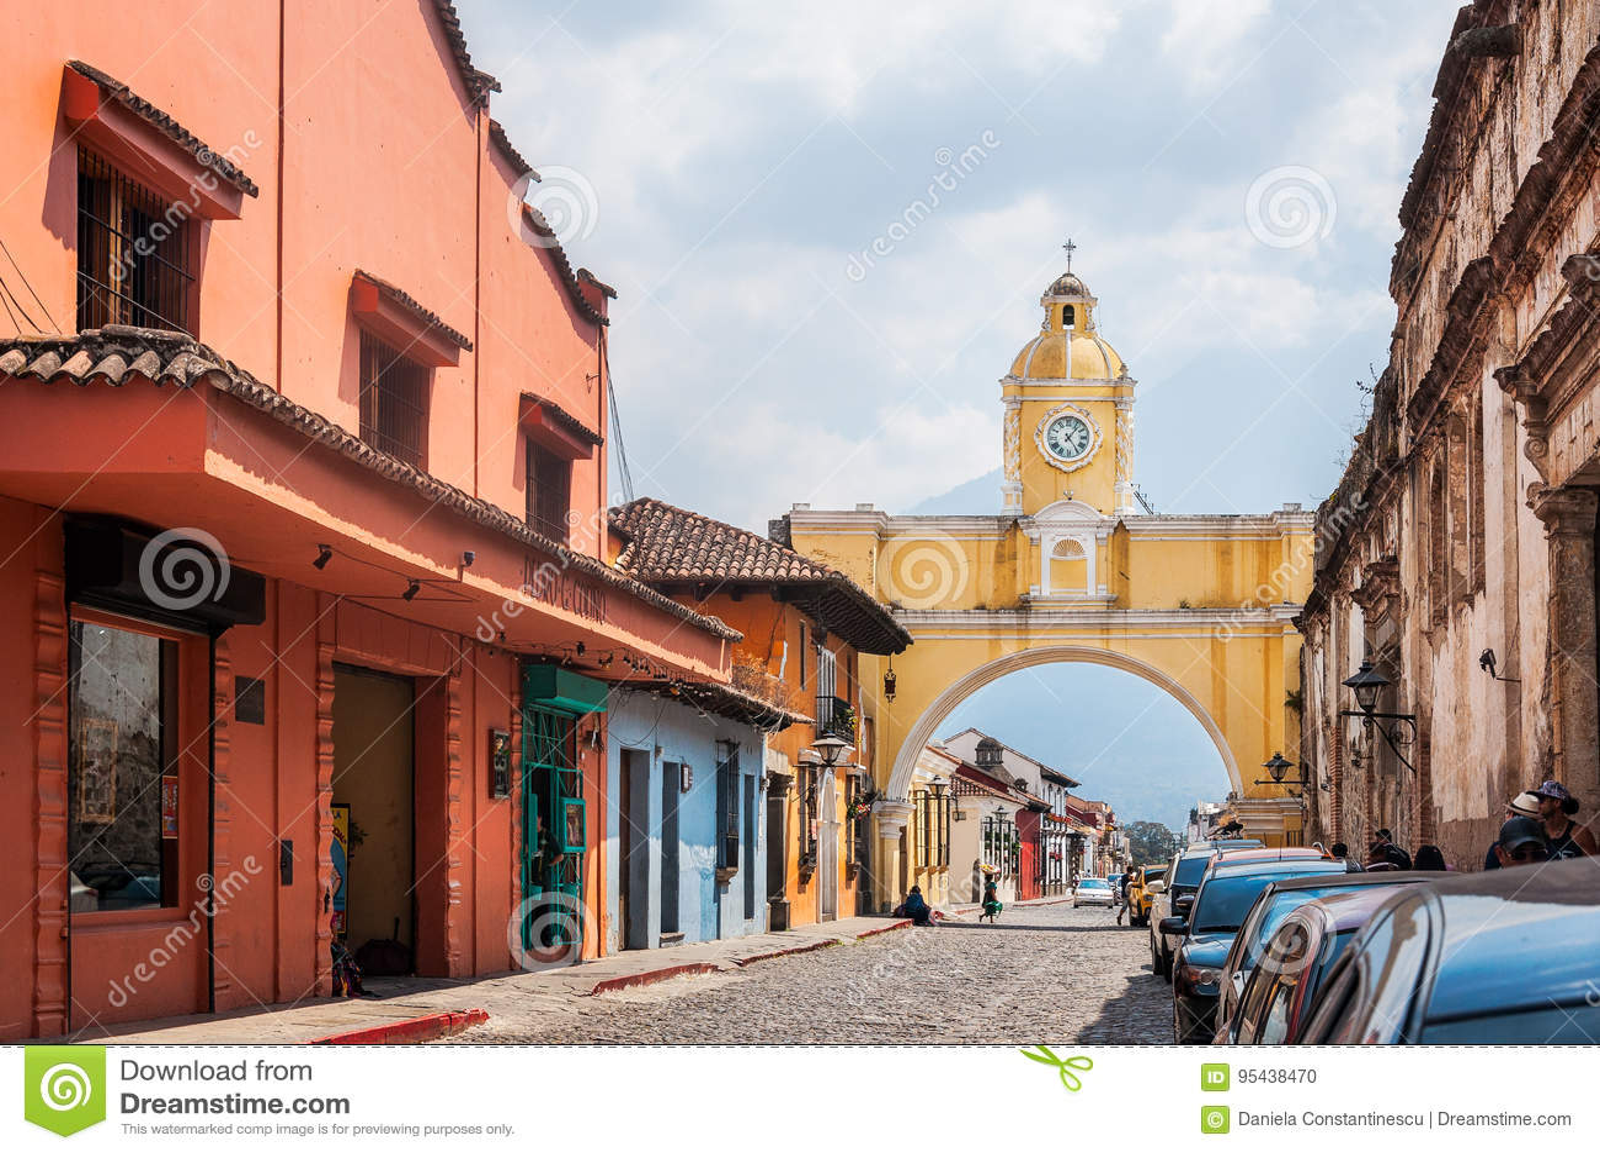 Santa Catalina Arch on main street in Antigua, Guatemala